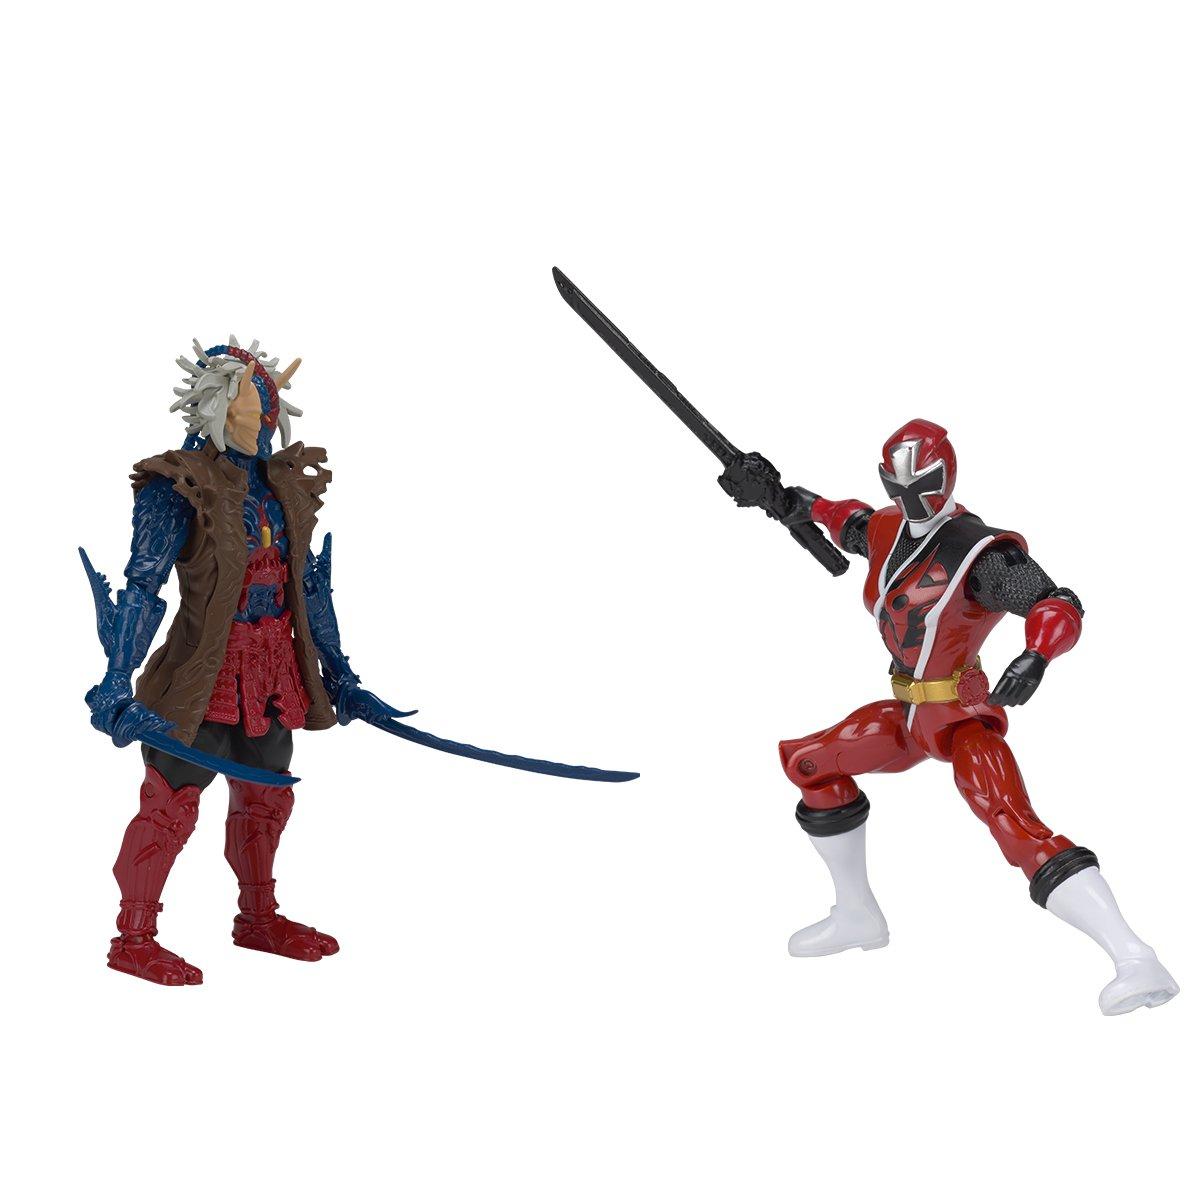 43848 Ranger Bleu Vs Ripperat Pack de 2 Figurines 12cm Power Rangers